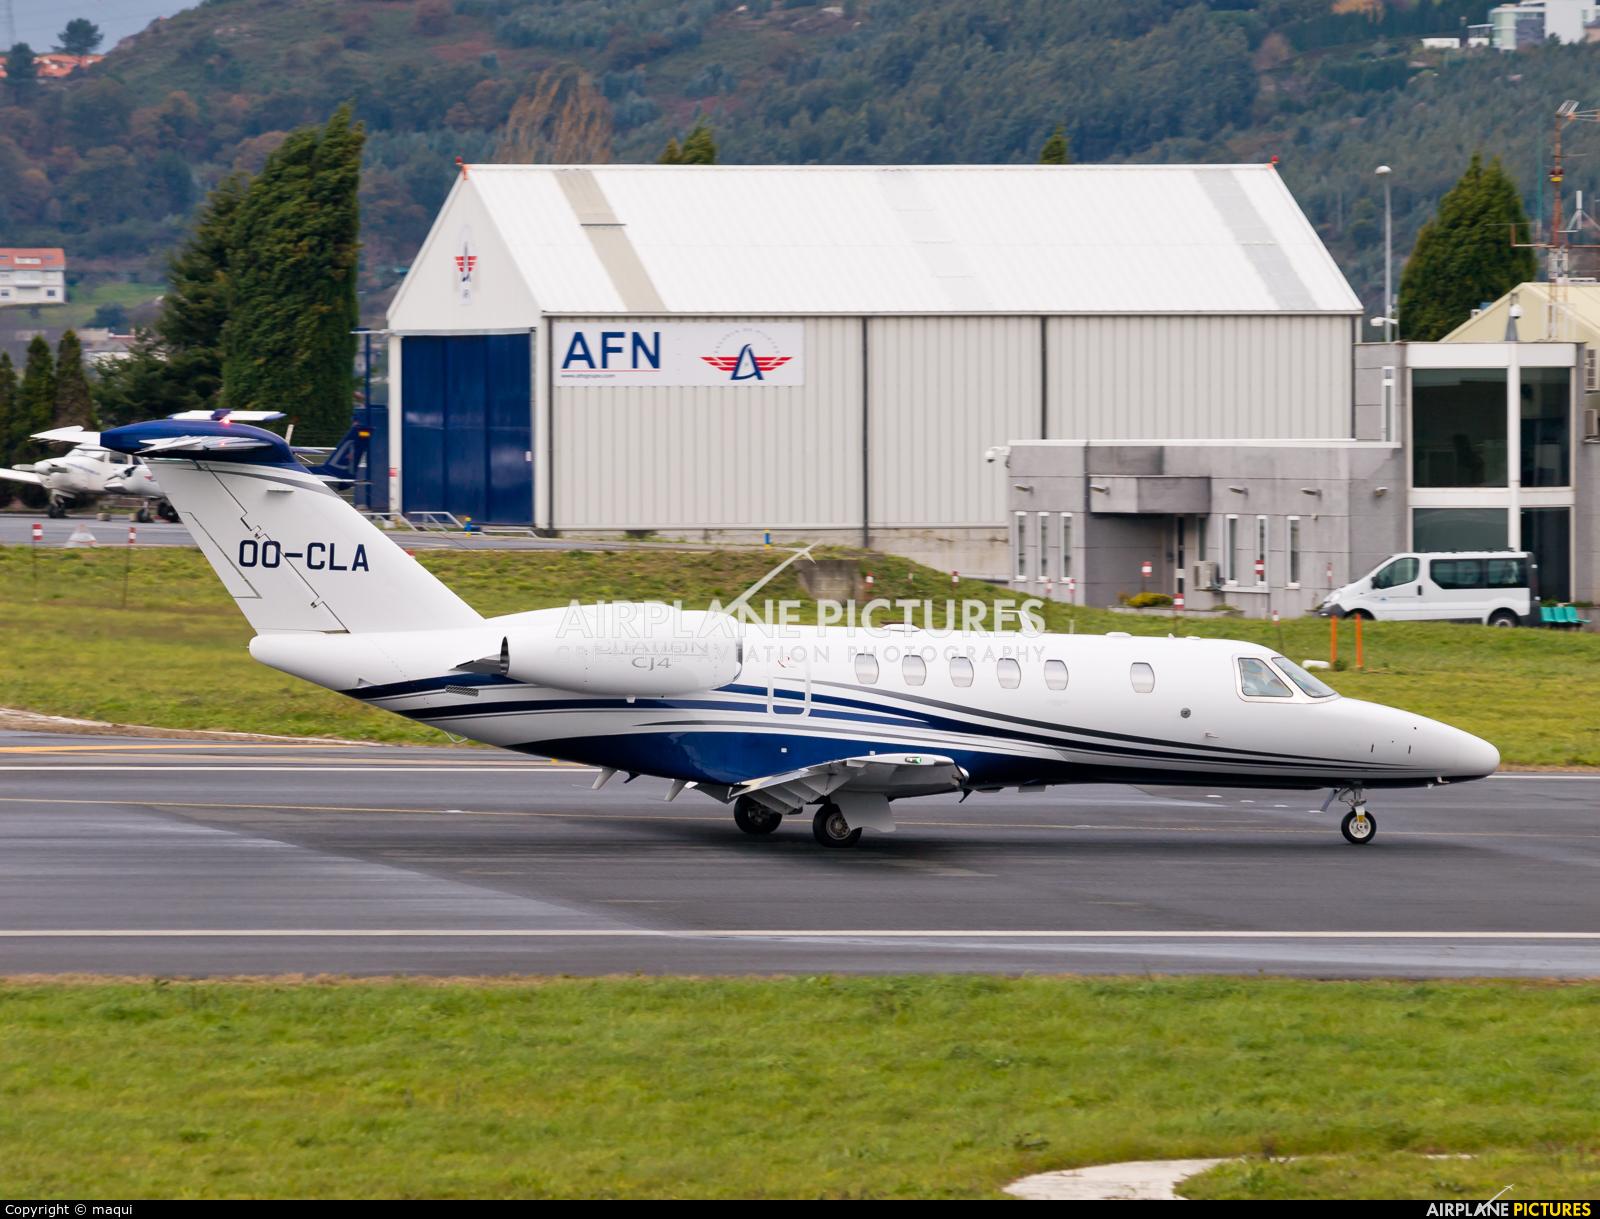 Luxaviation OO-CLA aircraft at La Coruña